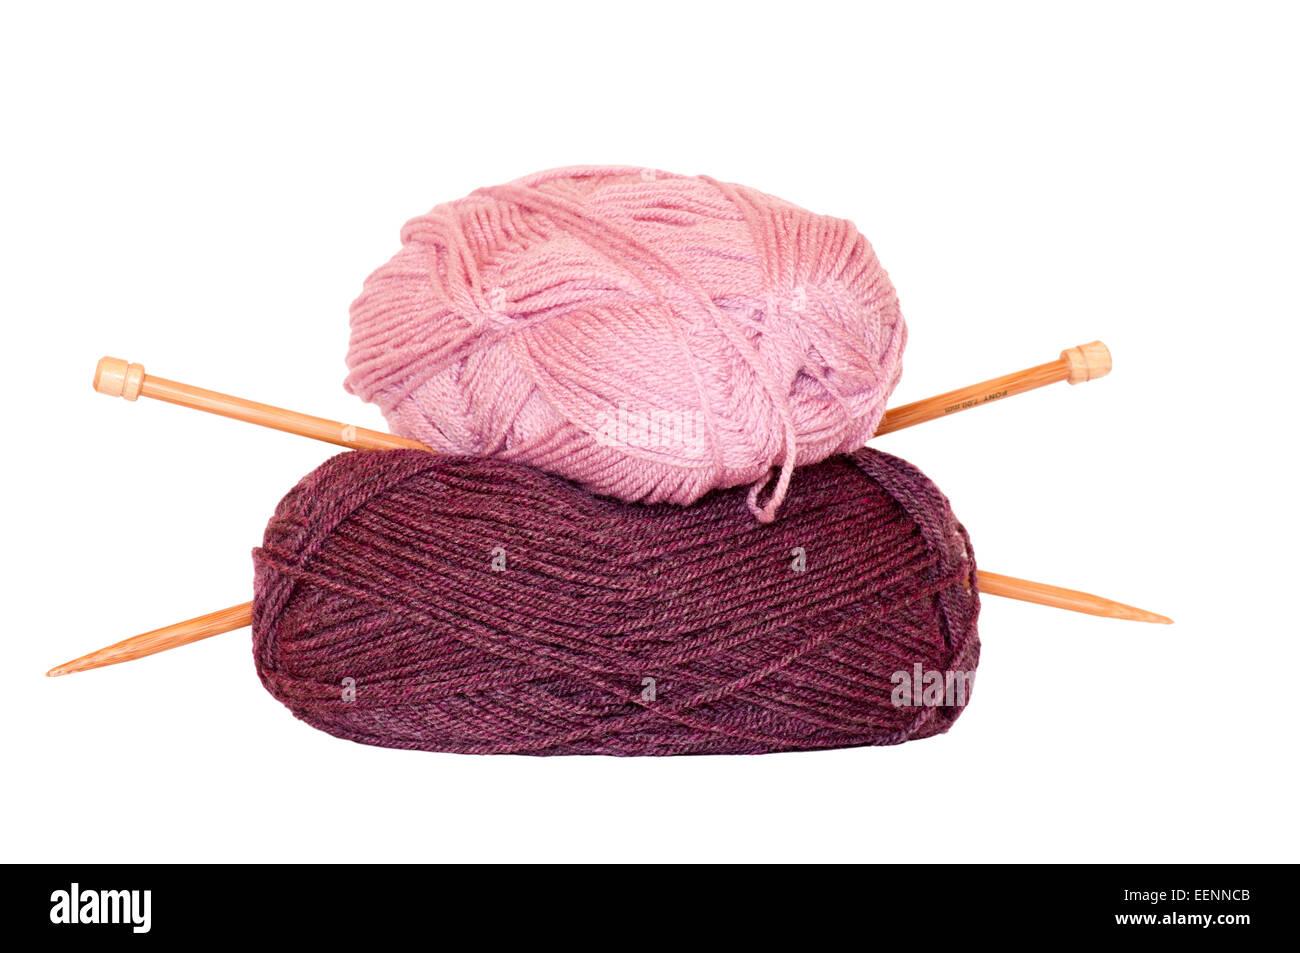 Balls Of Wool and Knitting Needles - Stock Image